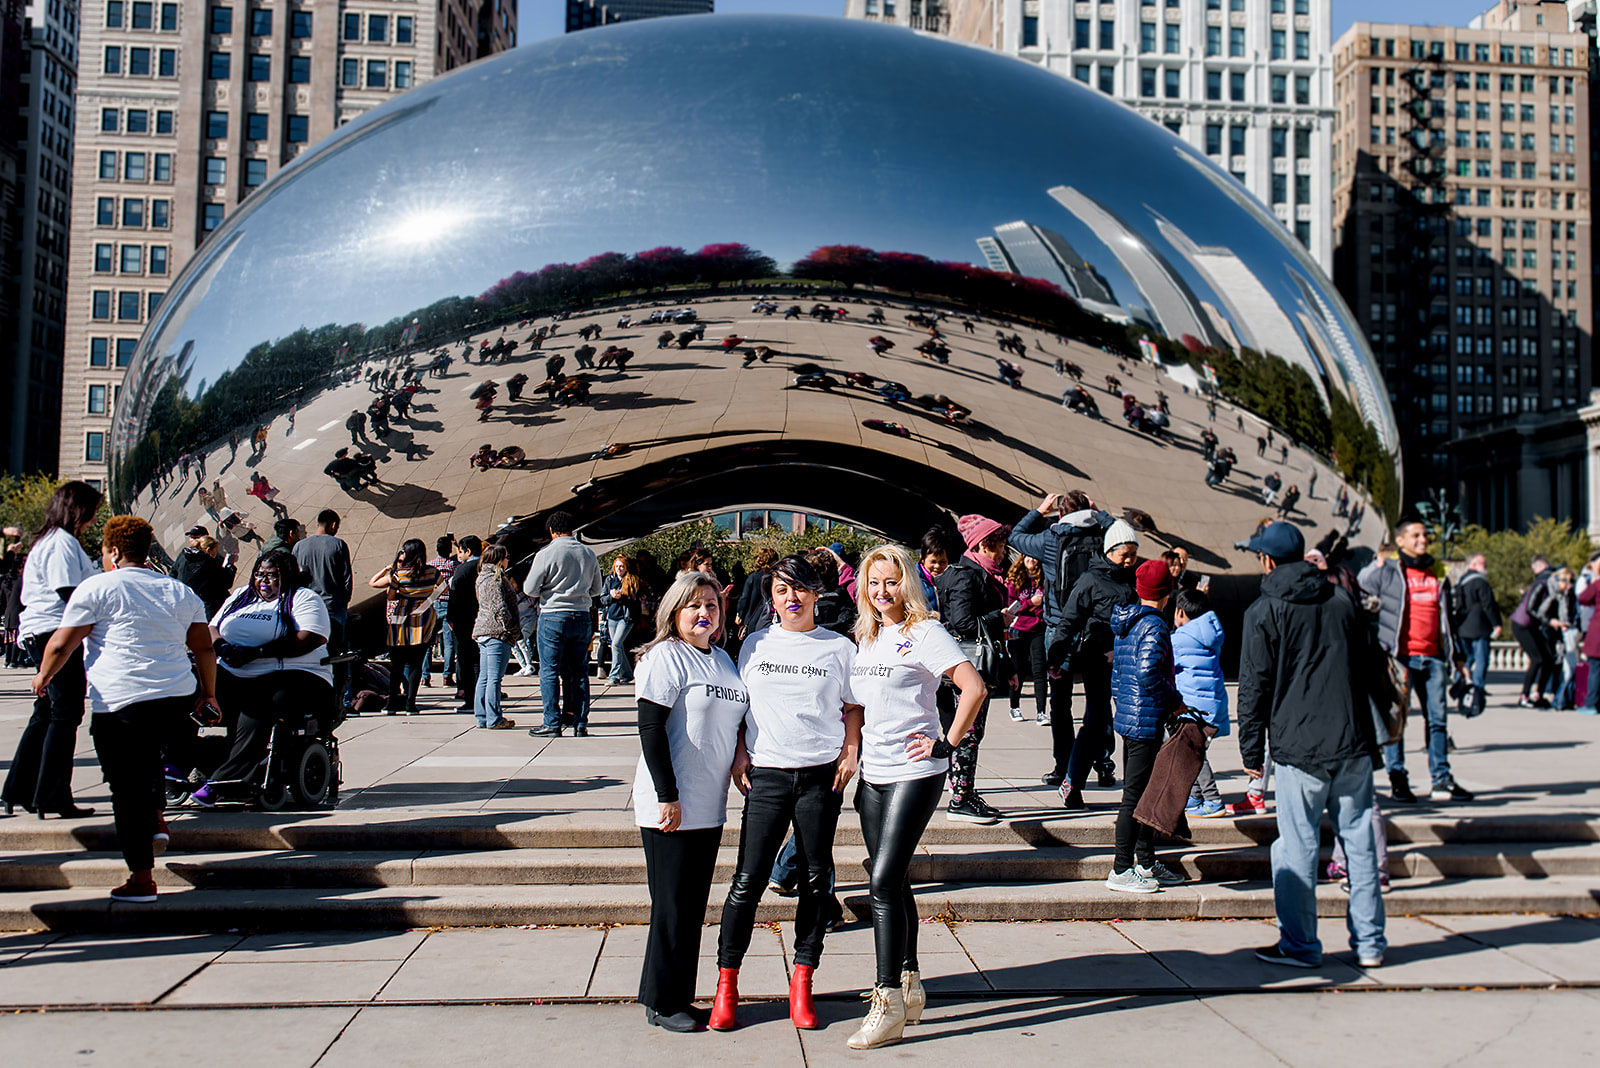 04-The Women's Justice League_Co-Founders Diana Rodrigez, Araceli Guasso, and Stephanie Pelzer_credit Mysi Grubbe © Soda Fountain Photo.jpg